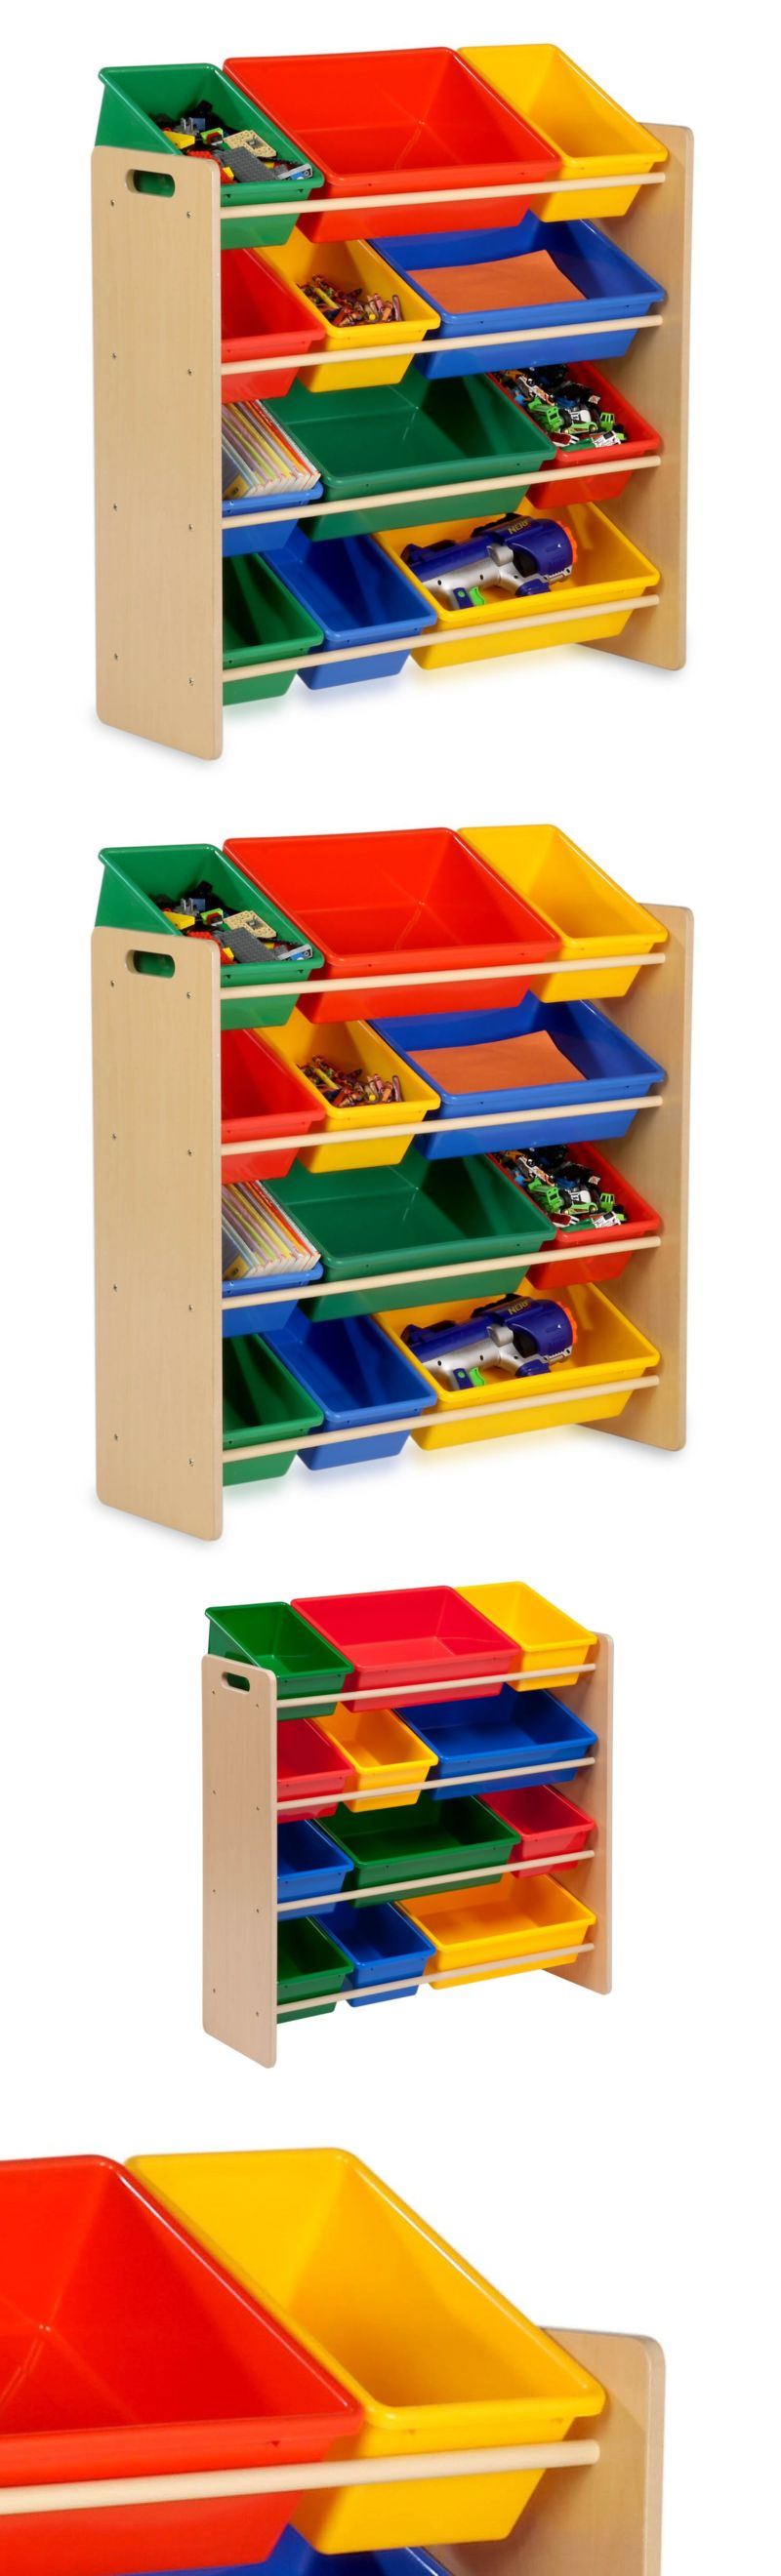 Storage Units 134651 Honey Can Do Srt 01602 Kids Toy Organizer And